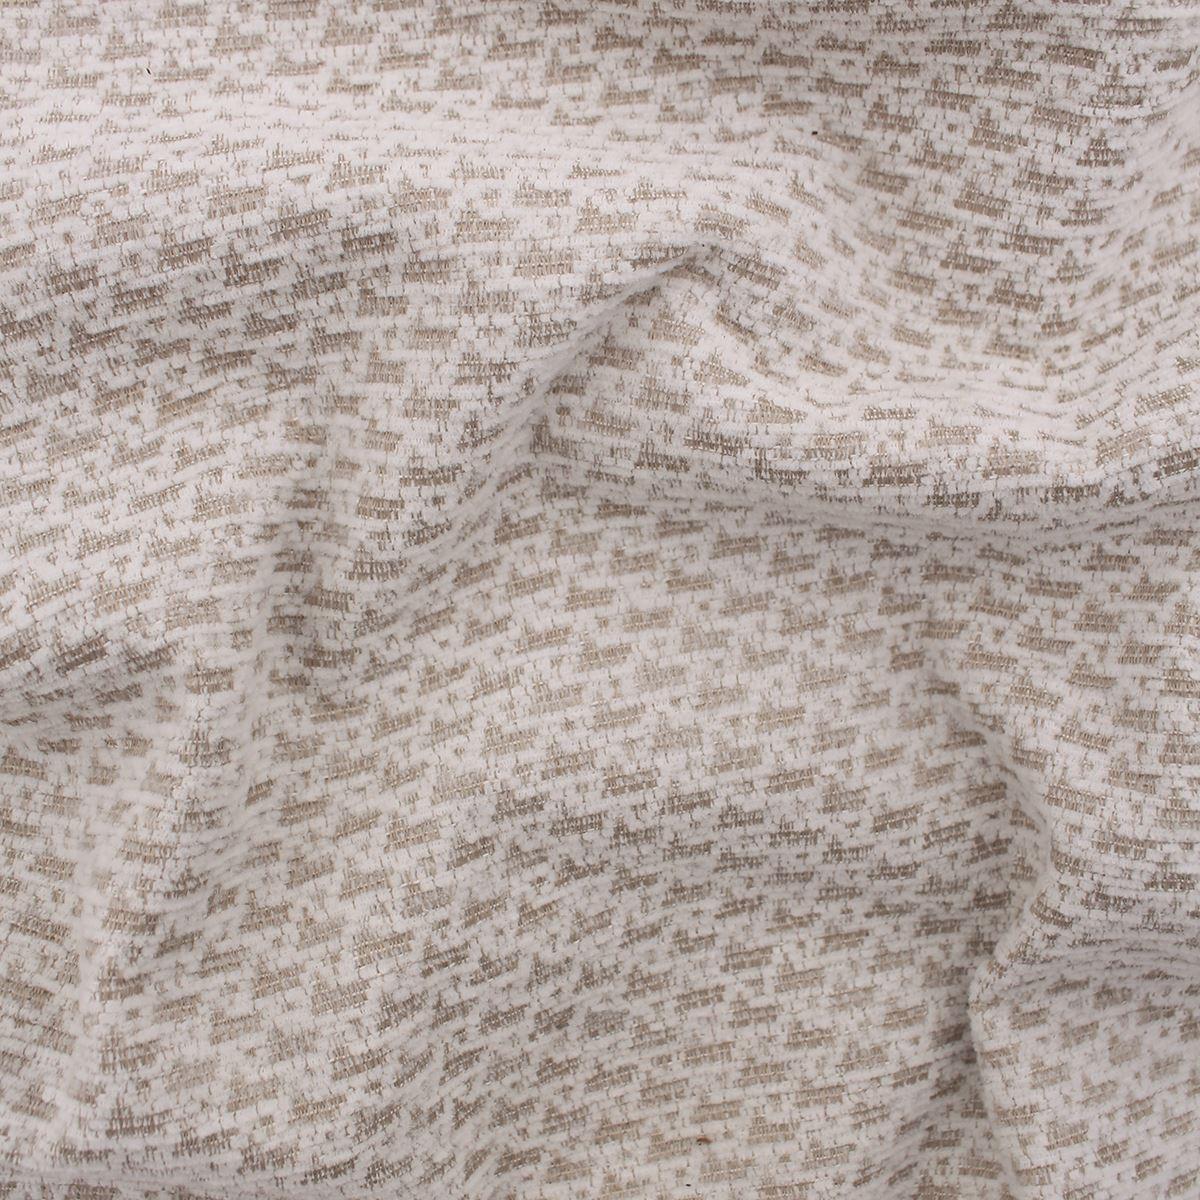 Cherub Marfil Boucle sarga tejido de terciopelo Ovillada Chenille Tela de tapicería